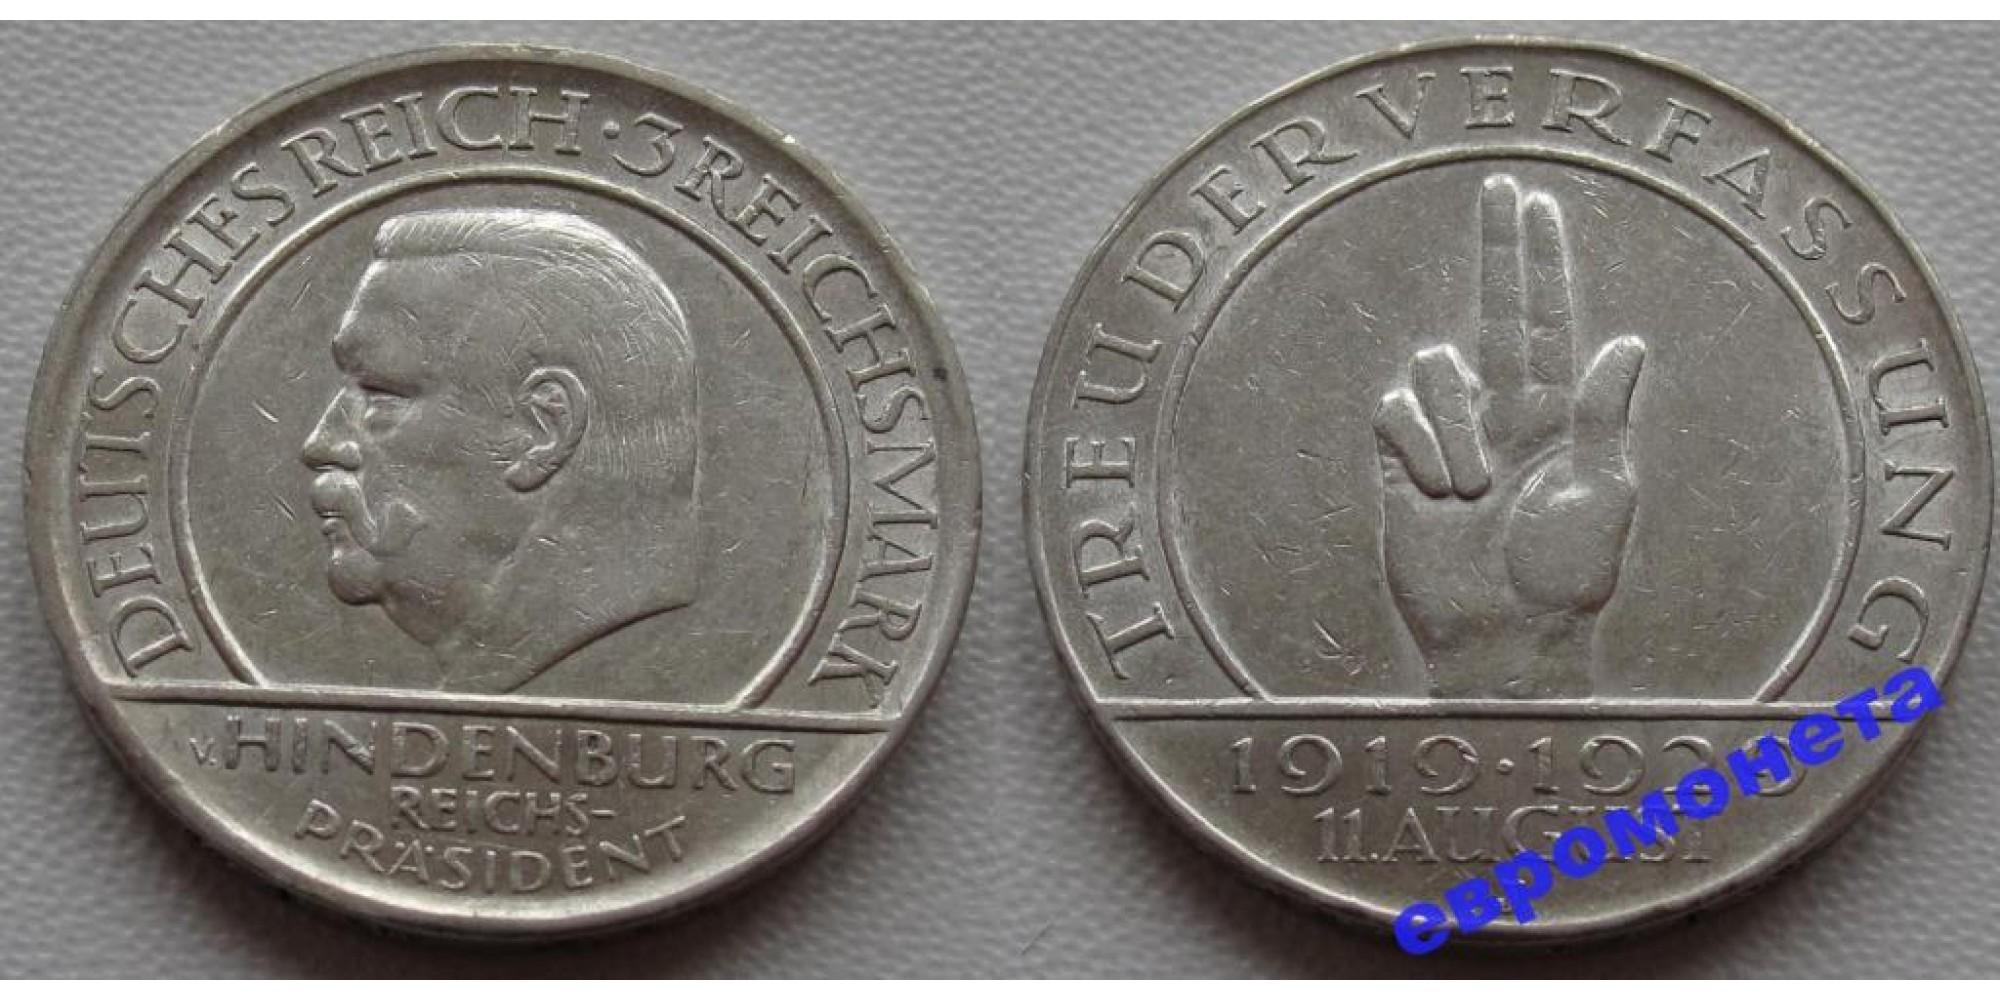 Германия Веймар 3 марки 1929 год J монета на фото серебро